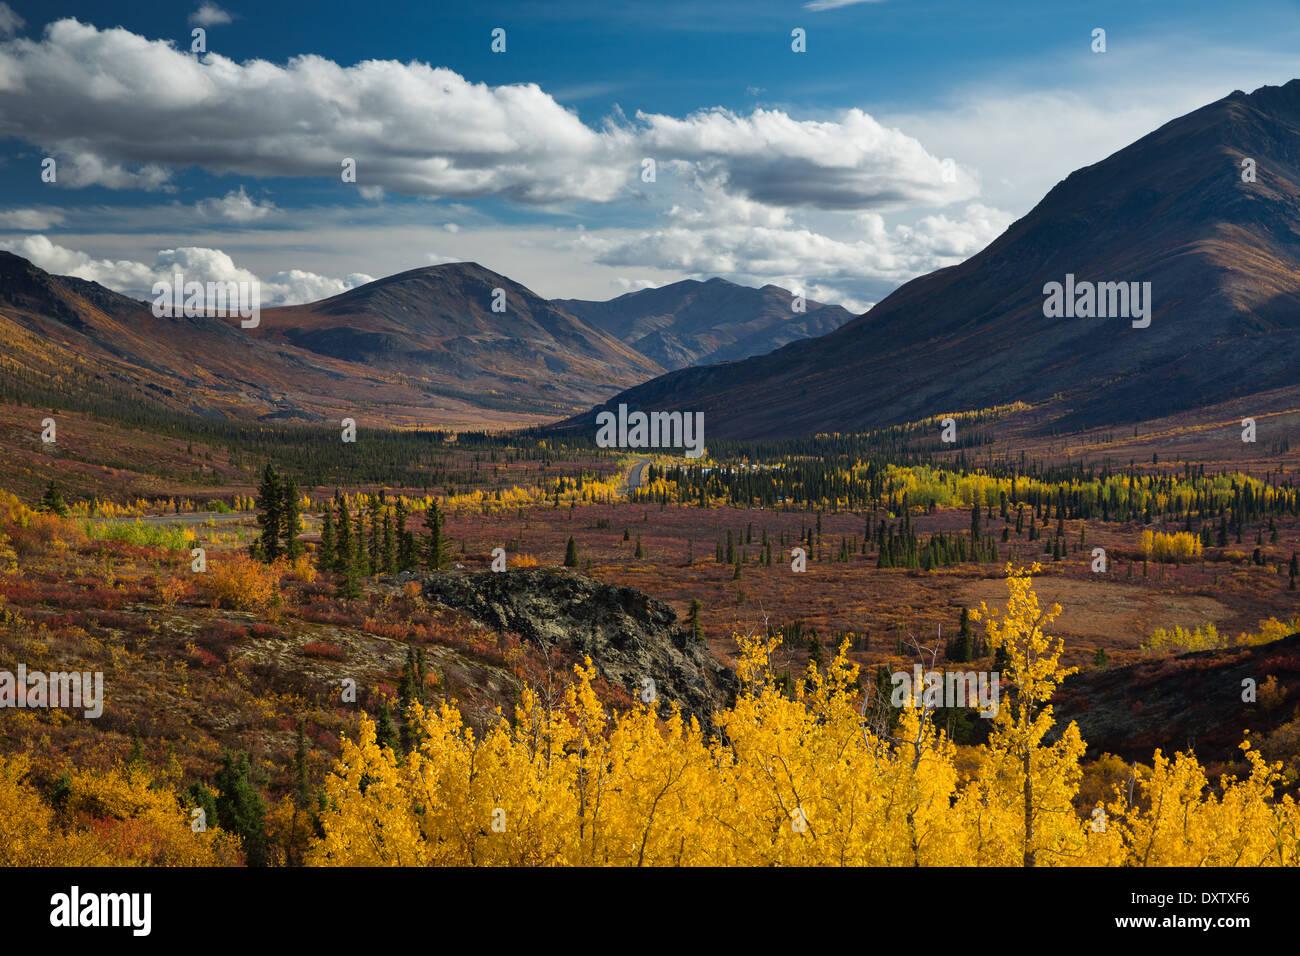 Der Prospector-Range in Tombstone Territorial Park, auf dem Dempster Highway, Yukon Territorien, Kanada Stockbild